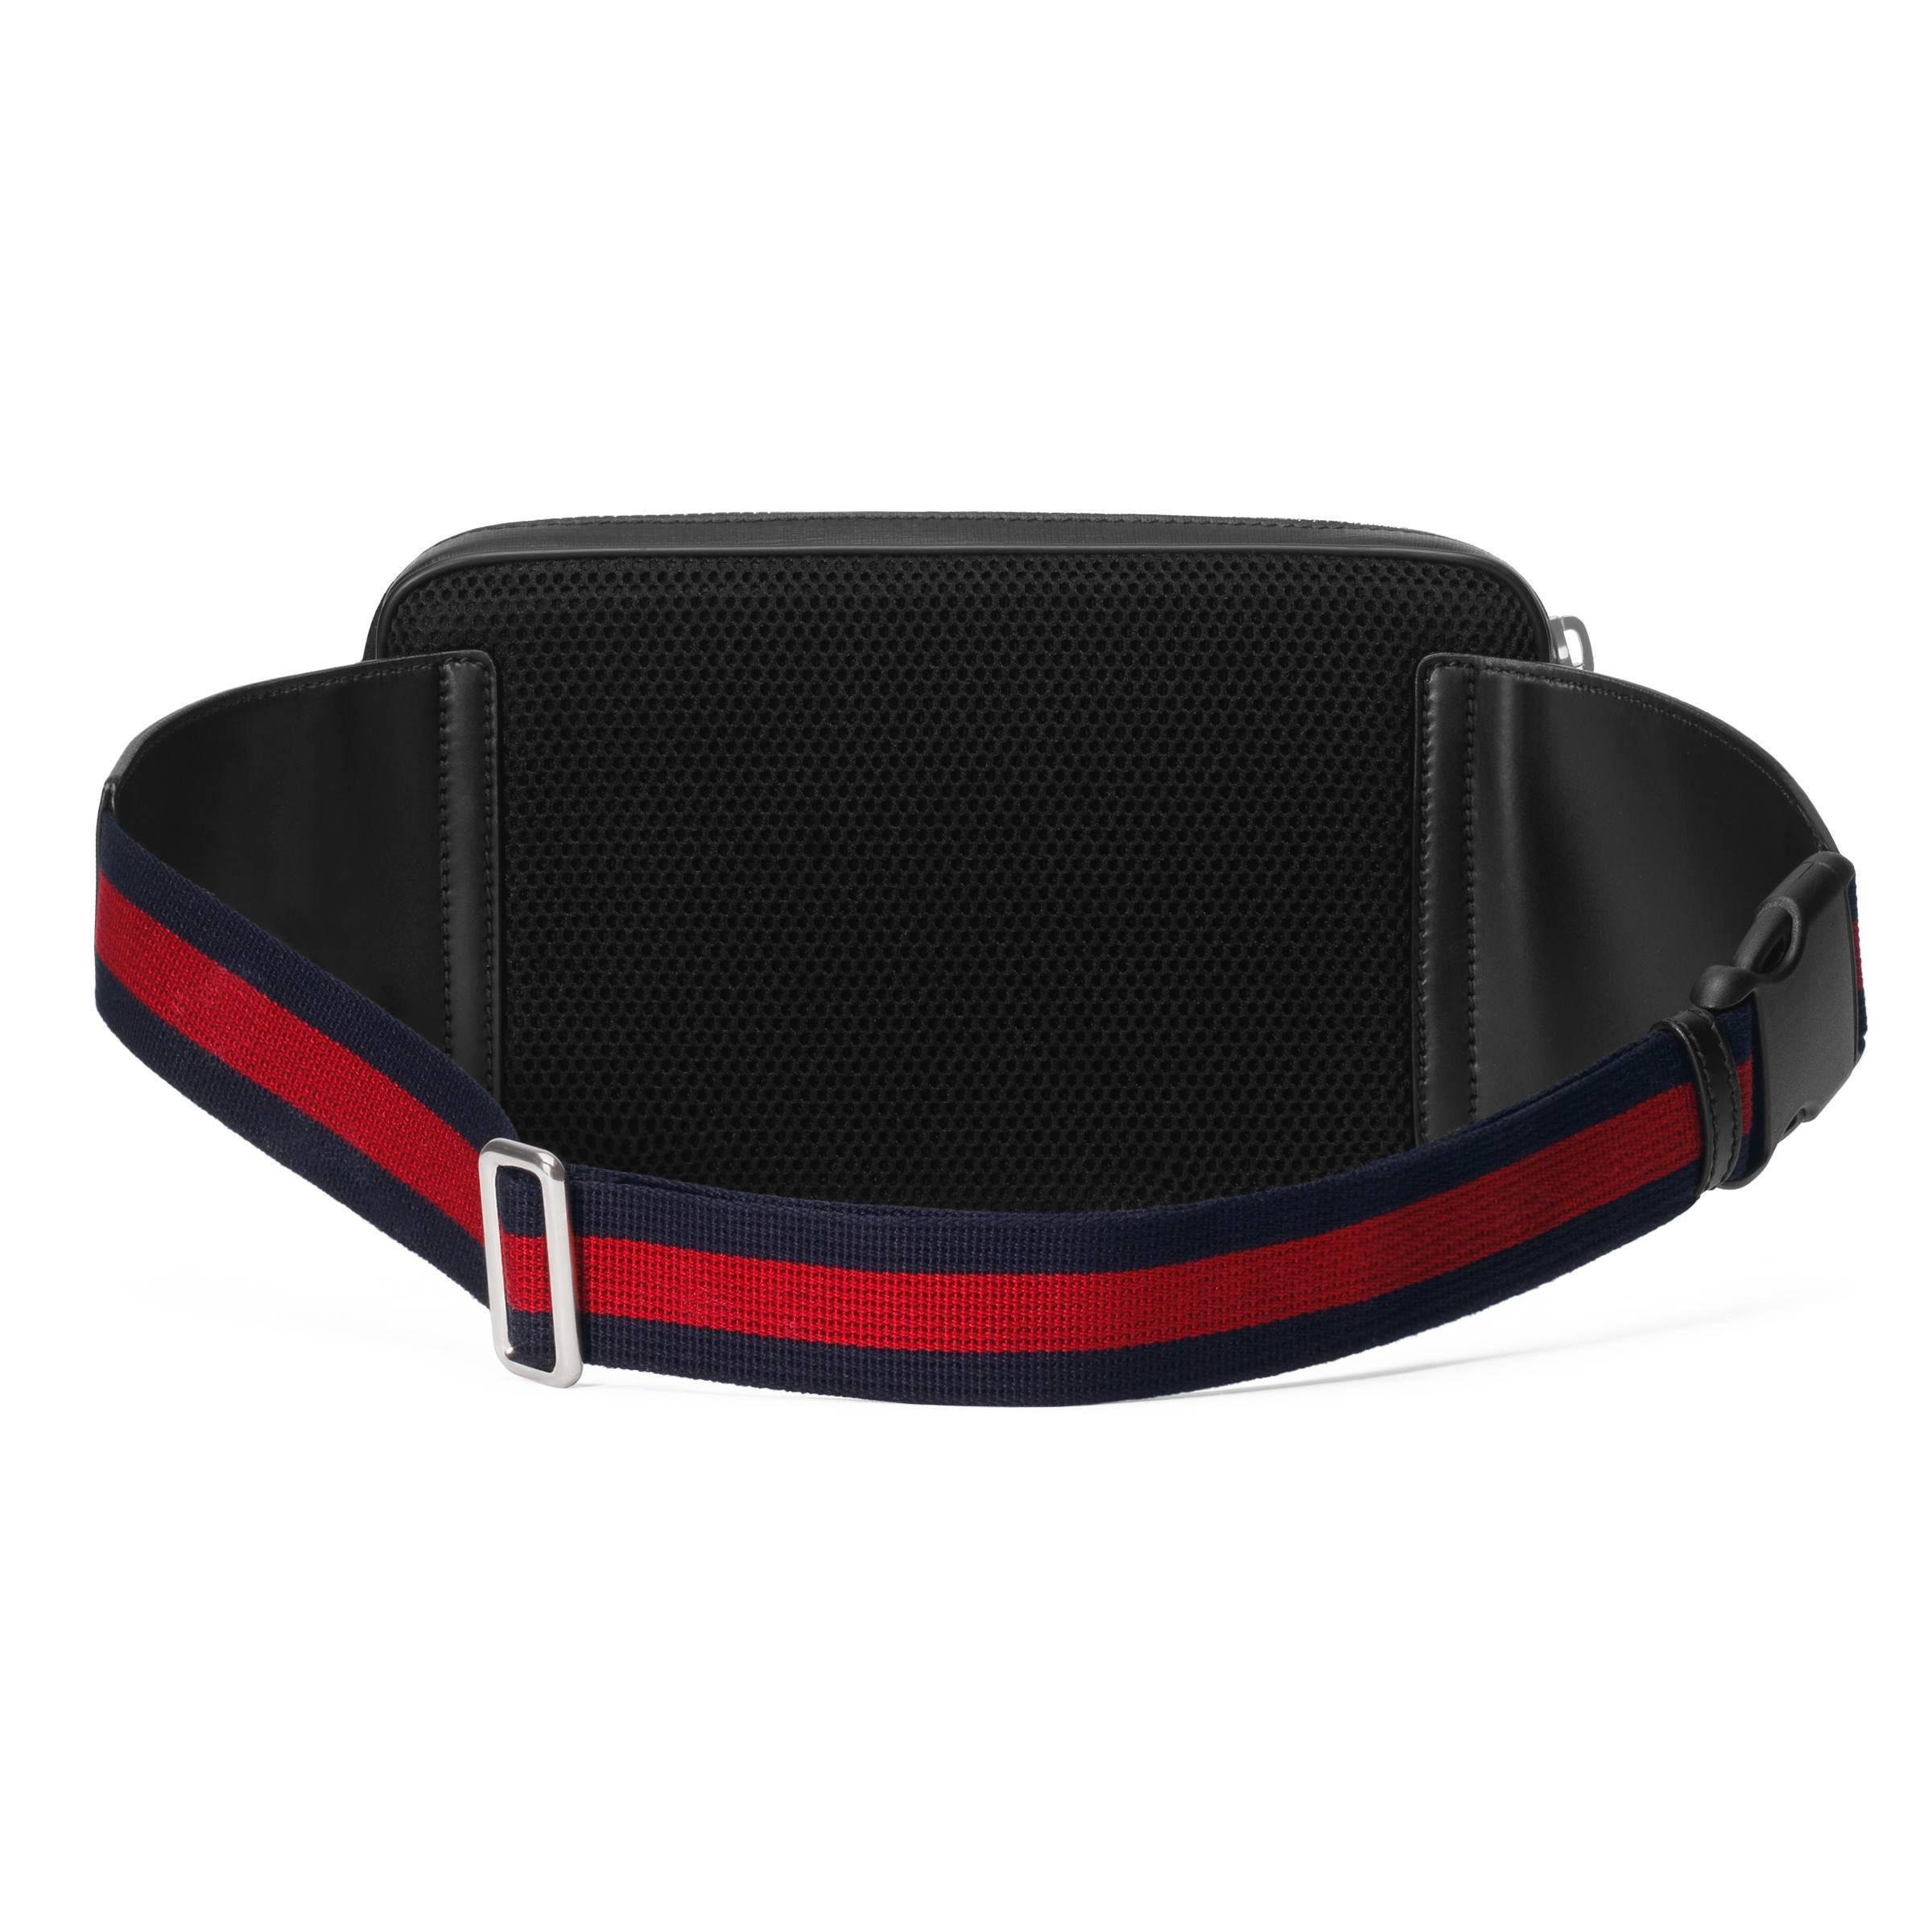 6a21d74a52e Gucci - Soft Gg Supreme Belt Bag Black for Men - Lyst. View fullscreen